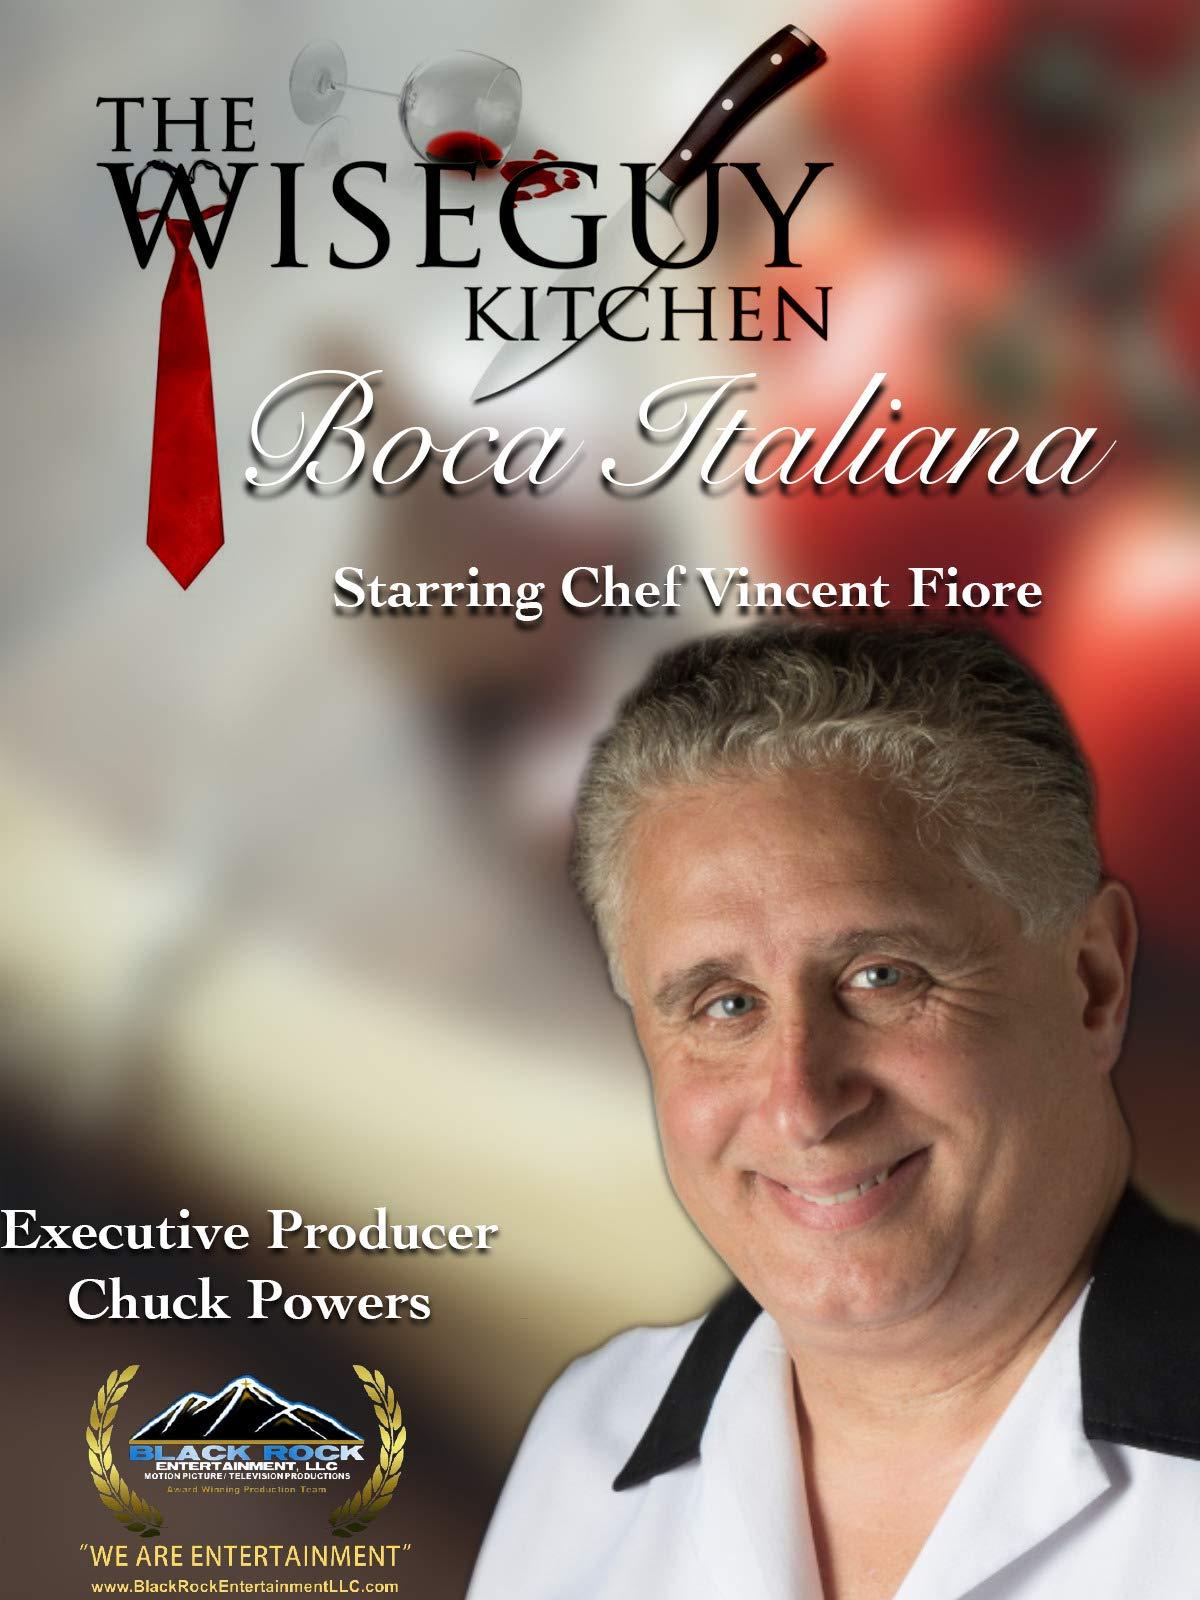 The Wiseguy Kitchen: Boca Italiana